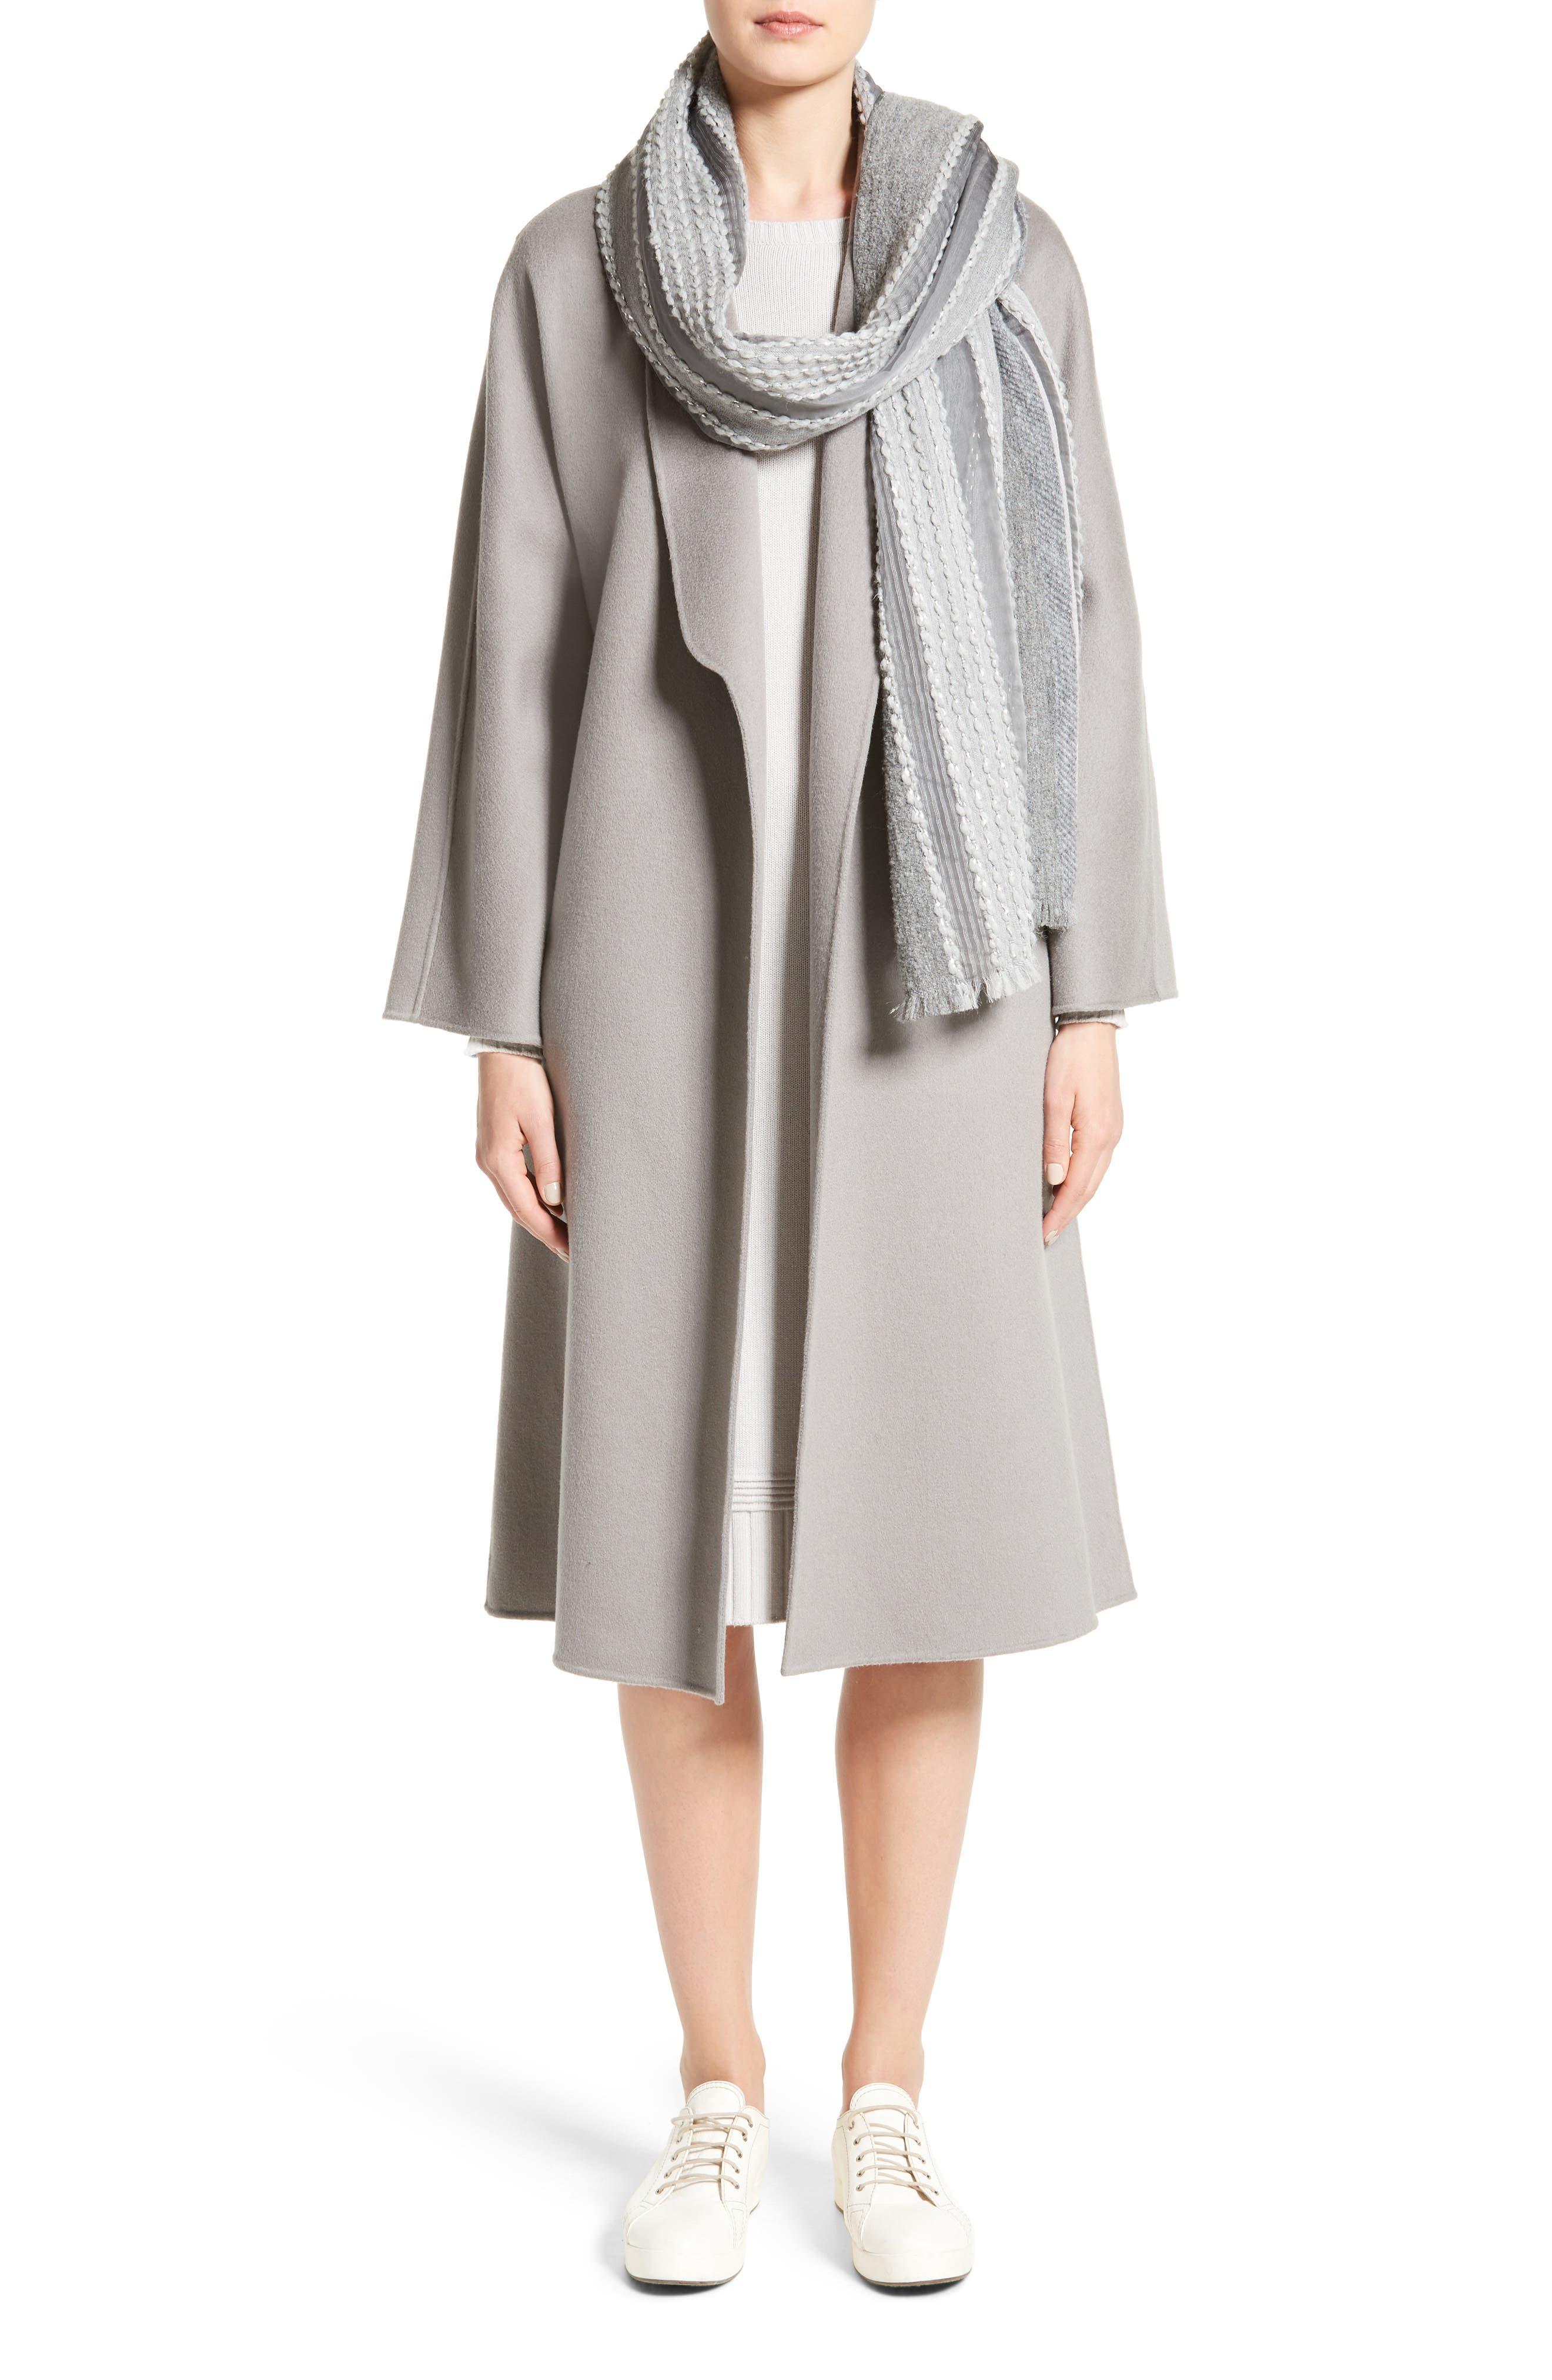 Armani Jeans Knit Sweater Dress,                             Main thumbnail 1, color,